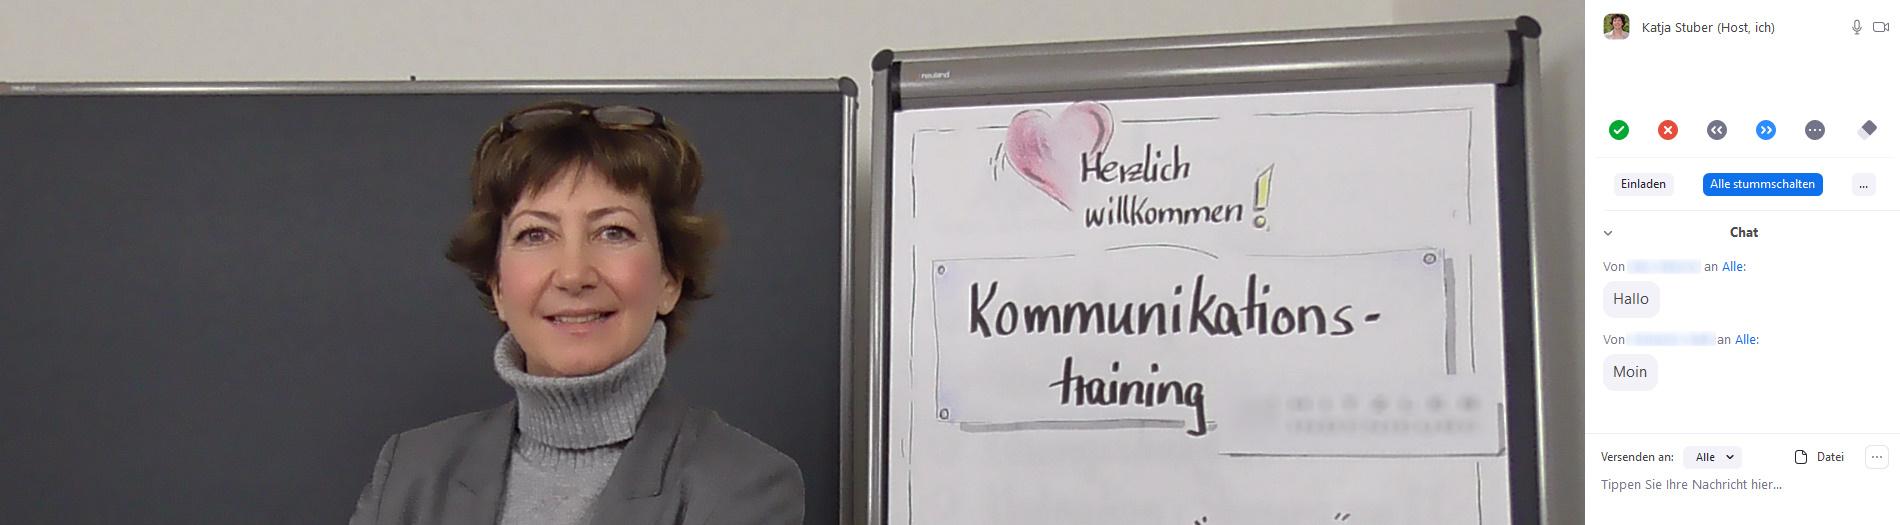 Katja Stuber - Onlinetraining